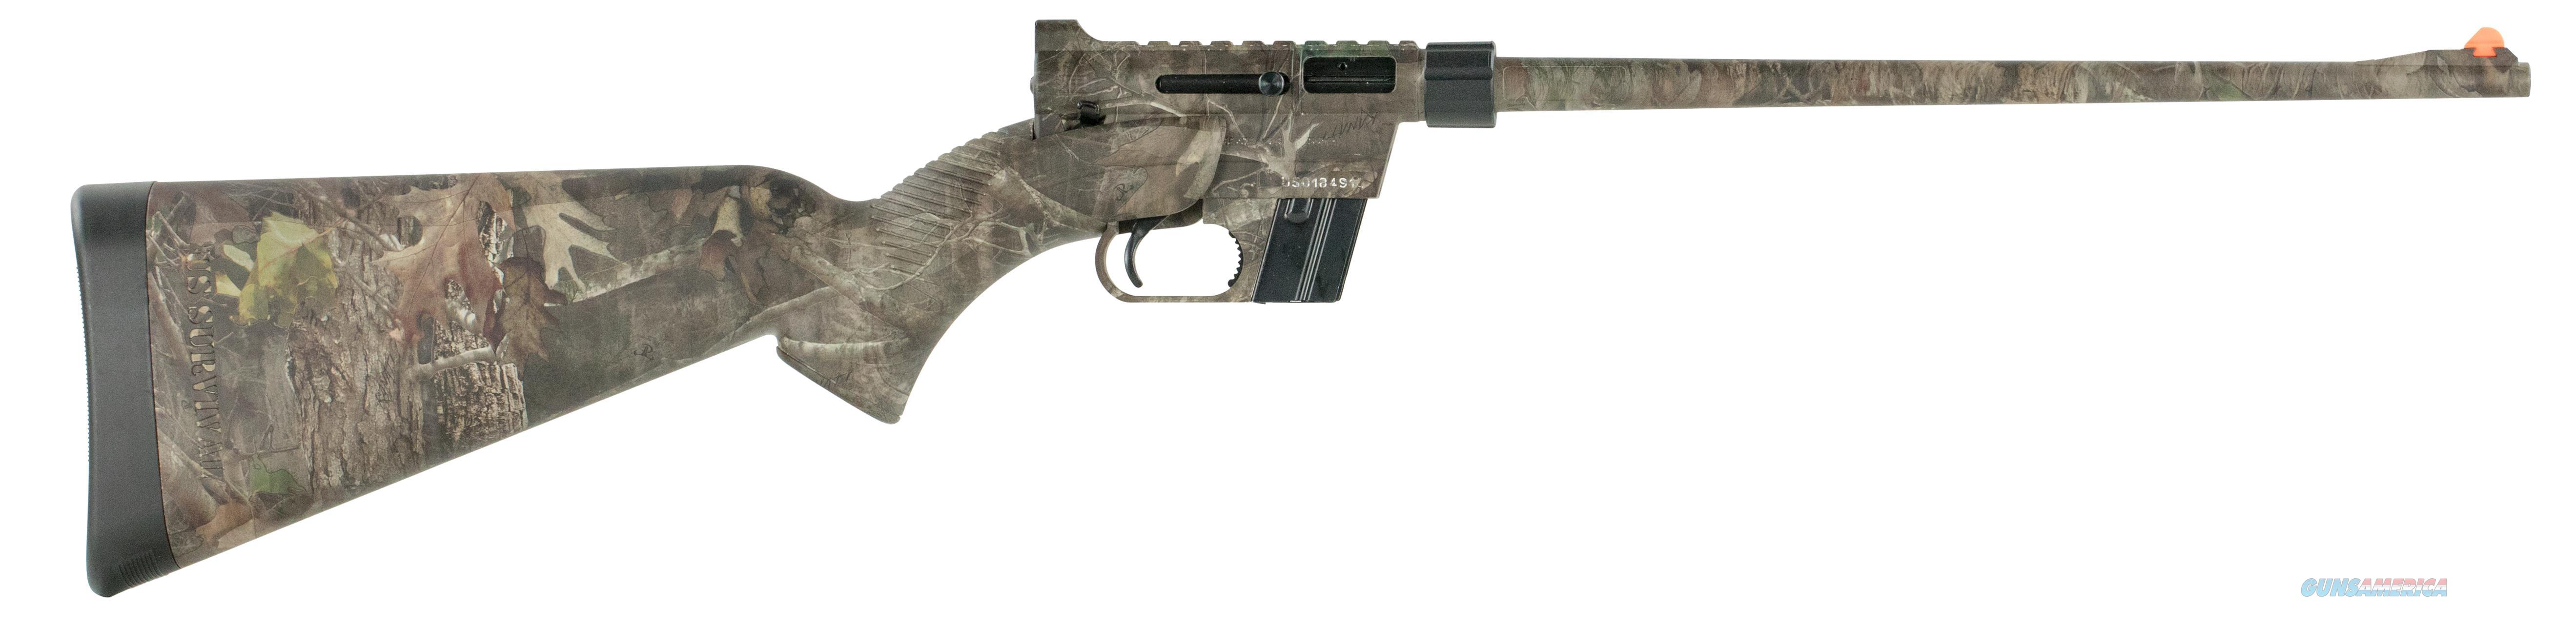 "Henry H002c U.S. Survival Ar-7  Semi-Automatic 22 Long Rifle (Lr) 16.5"" 8+1 Synthetic Truetimber Kanati Stk Truetimber Kanati H002C  Guns > Rifles > H Misc Rifles"